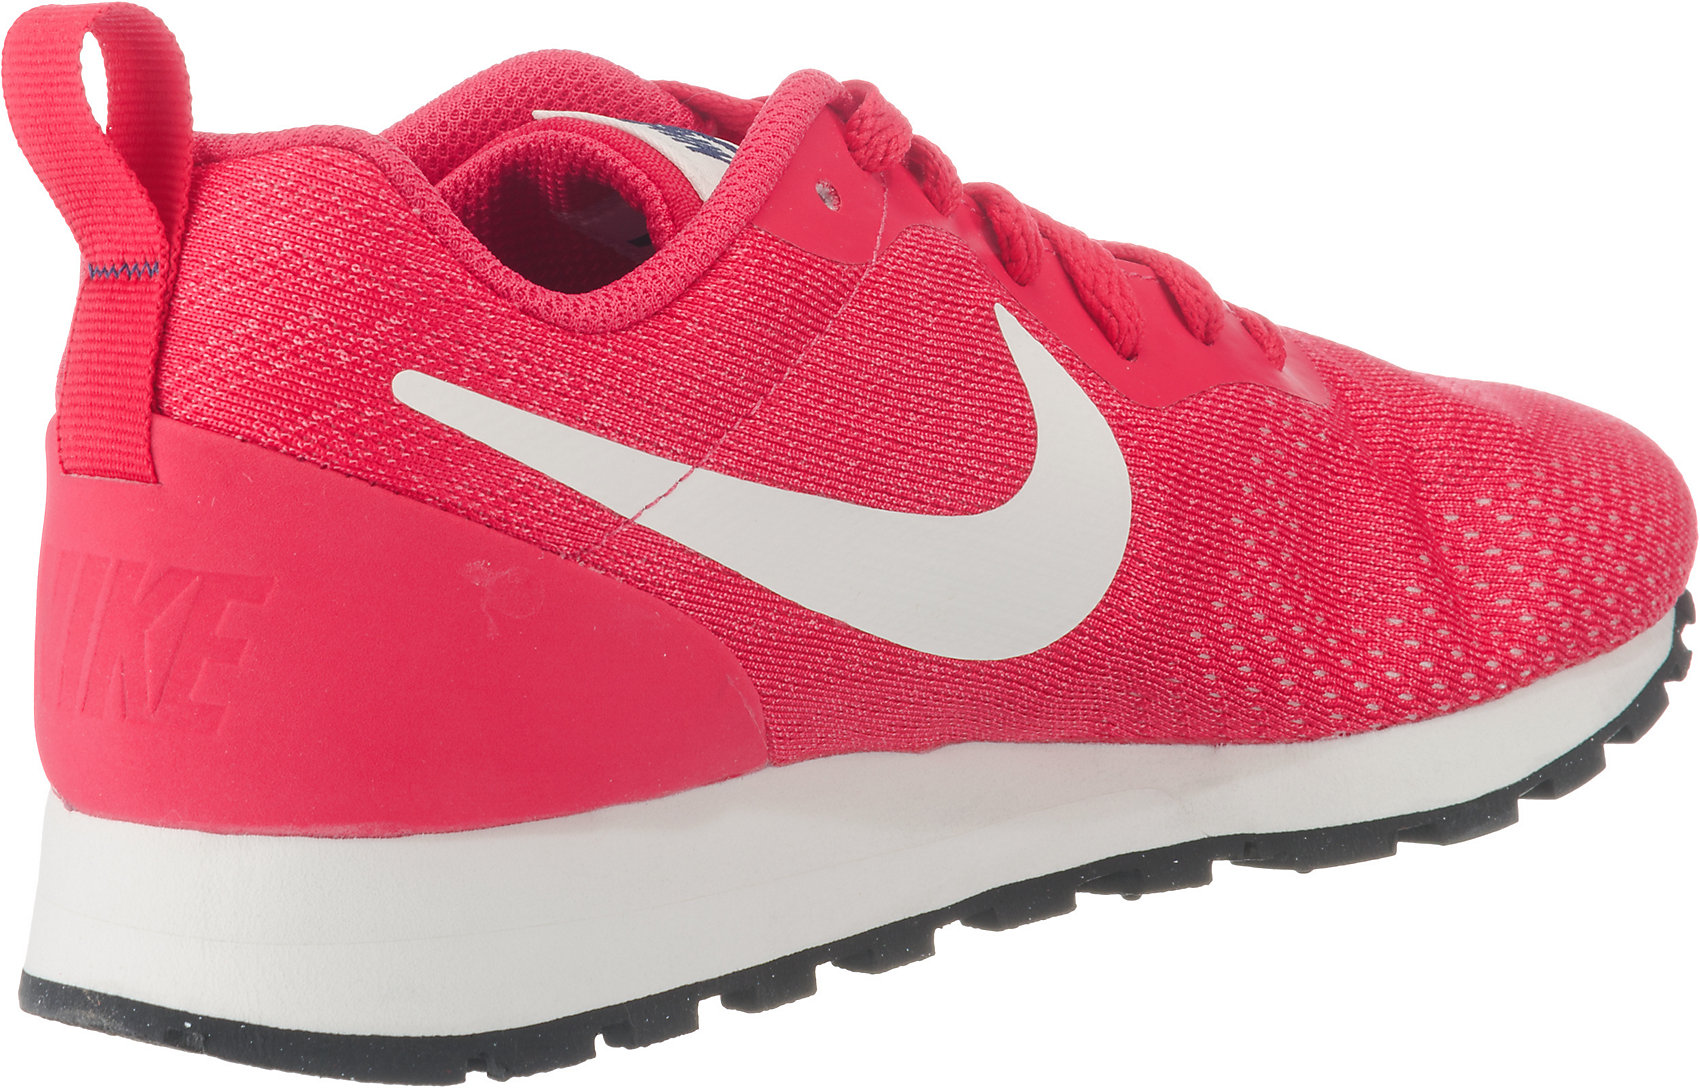 Details zu Neu Nike Sportswear MD Runner Mesh Sneakers 7631496 für Damen pink